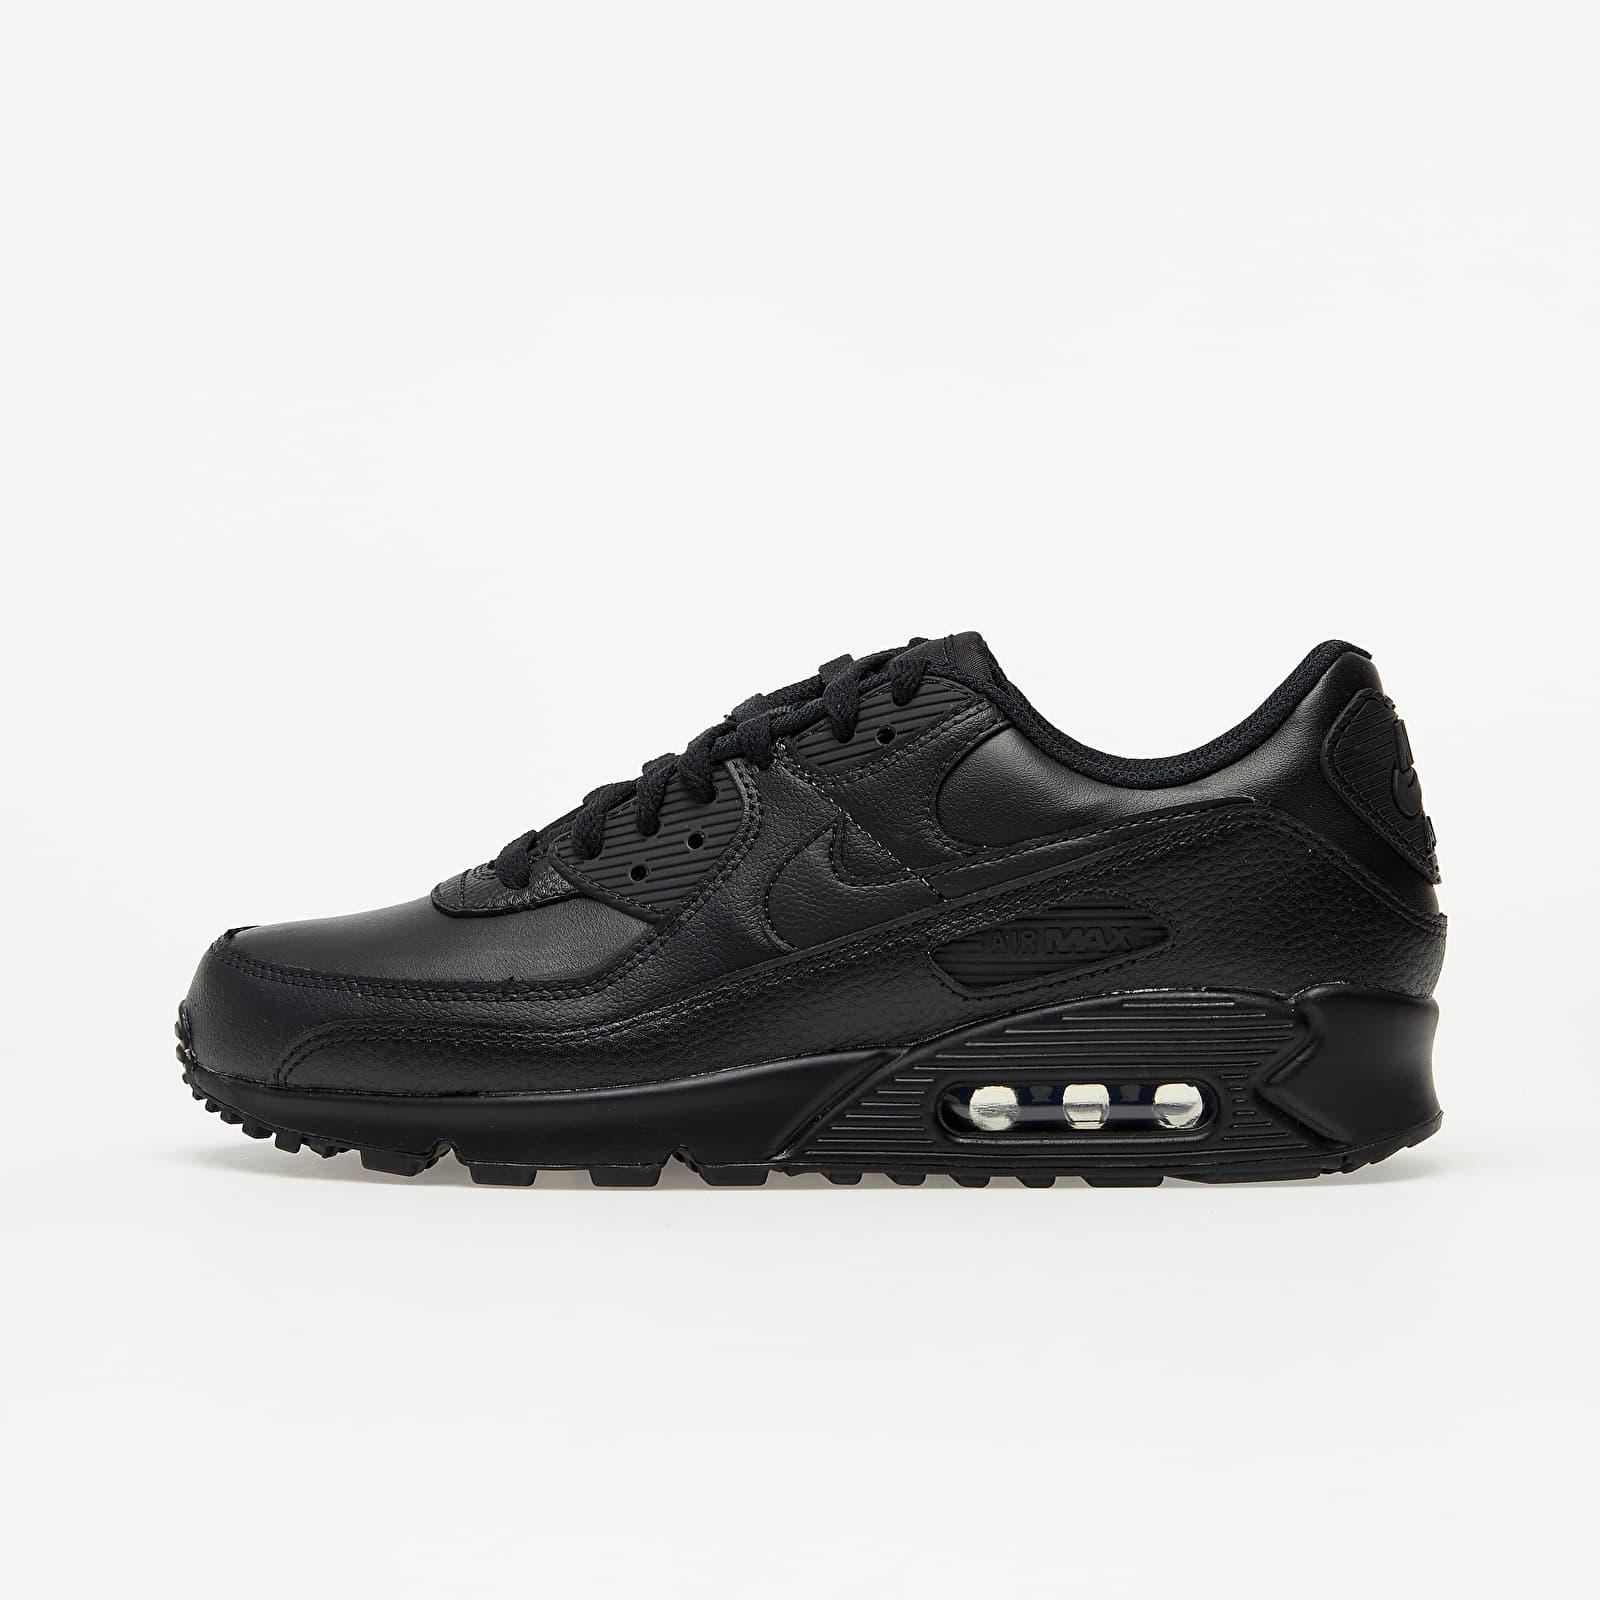 Chaussures et baskets homme Nike Air Max 90 Leather Black/ Black-Black